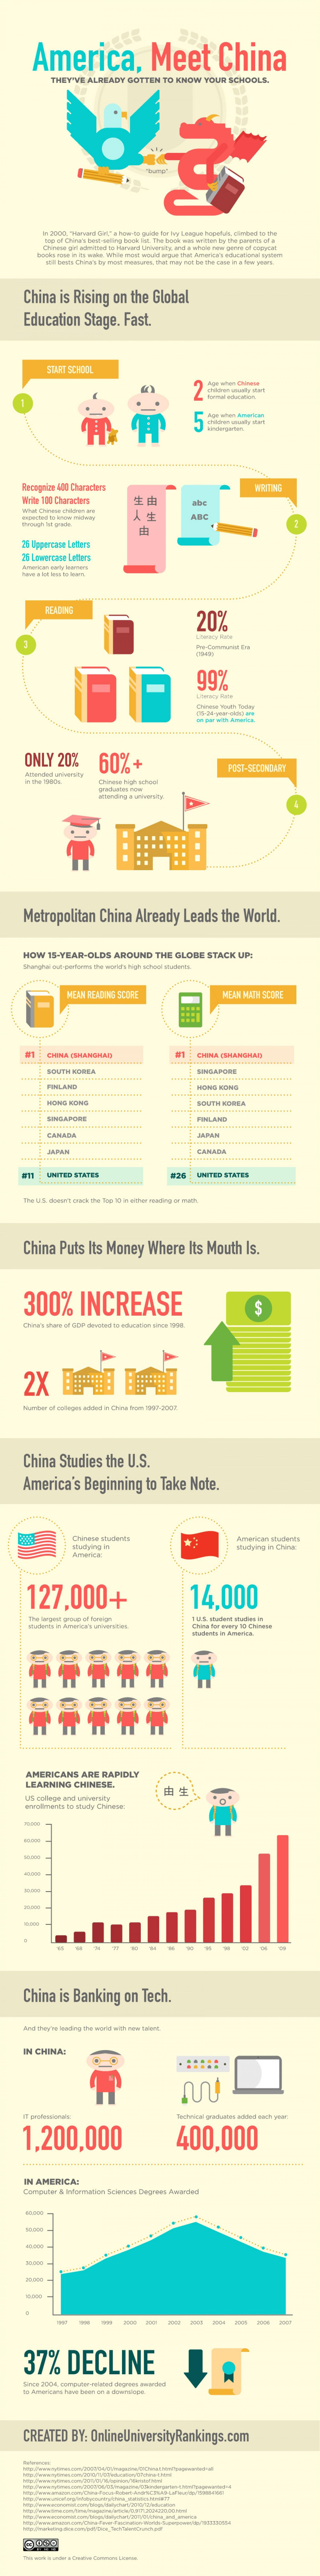 18. America meets China